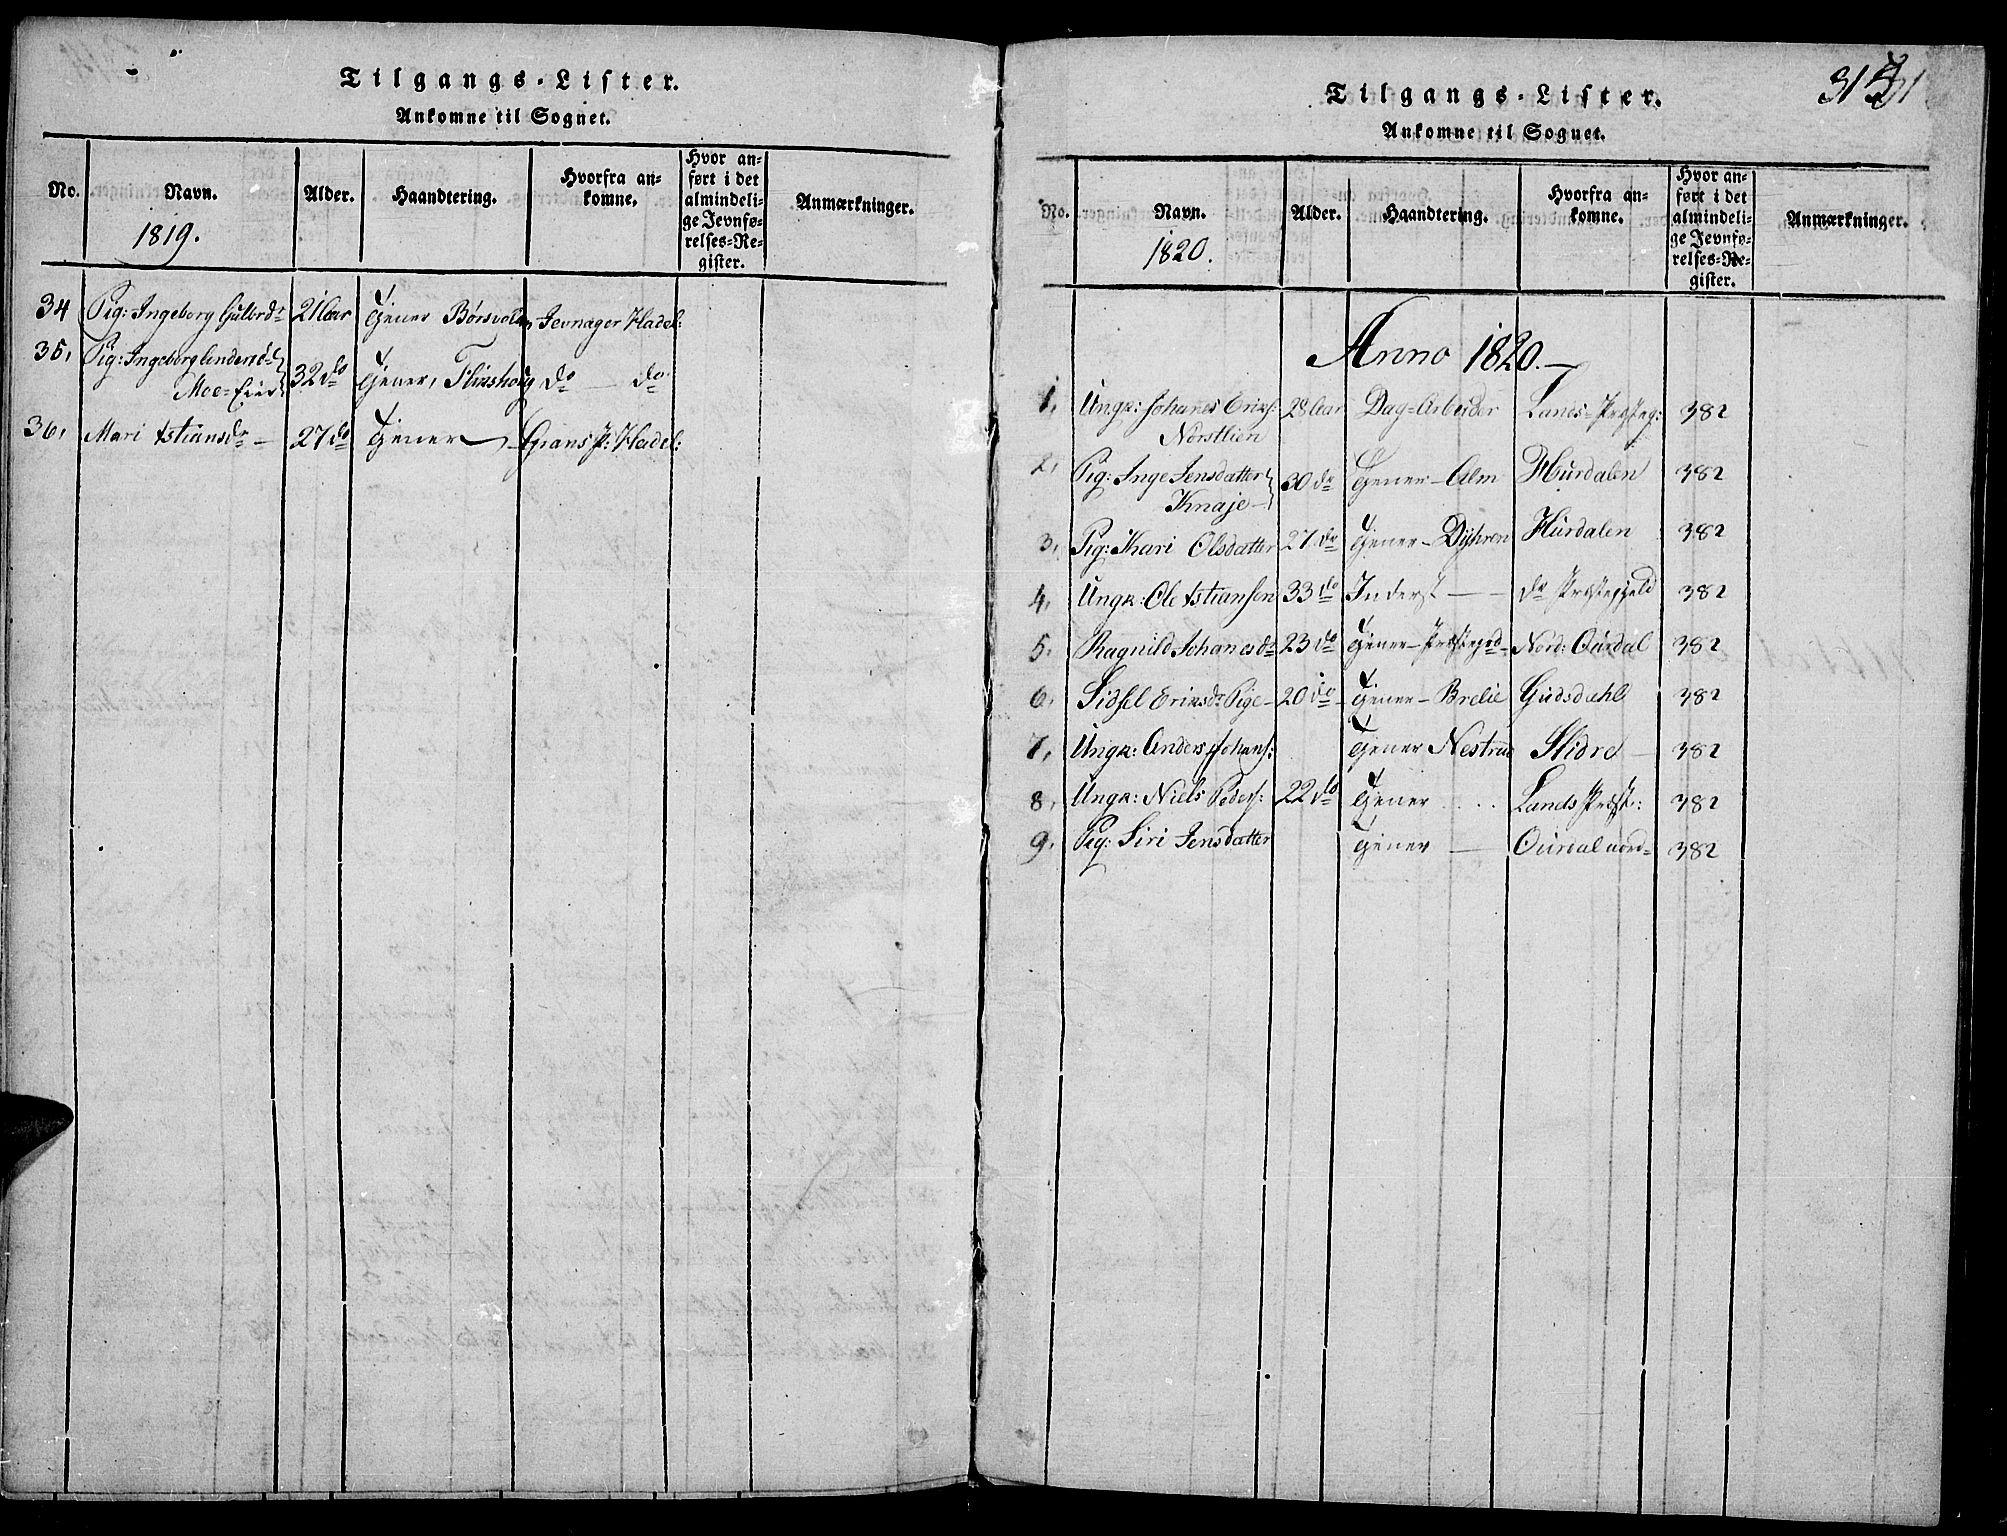 SAH, Toten prestekontor, Ministerialbok nr. 9, 1814-1820, s. 315